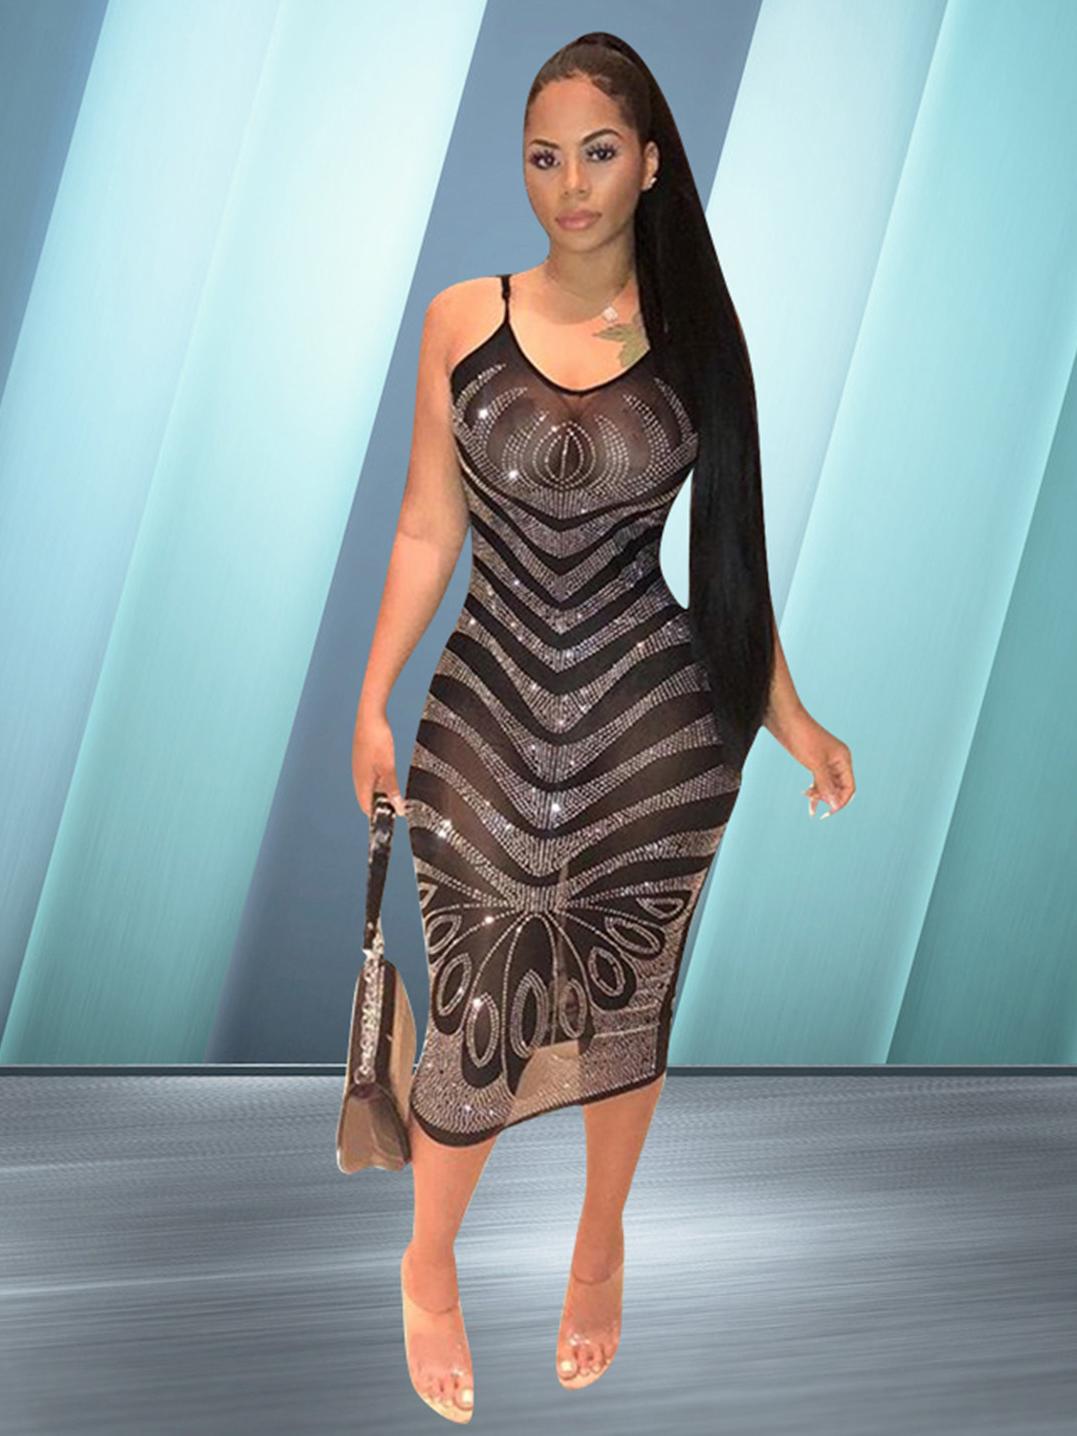 Perspective Sheer Tiny Rhinestone Black Slip Dress